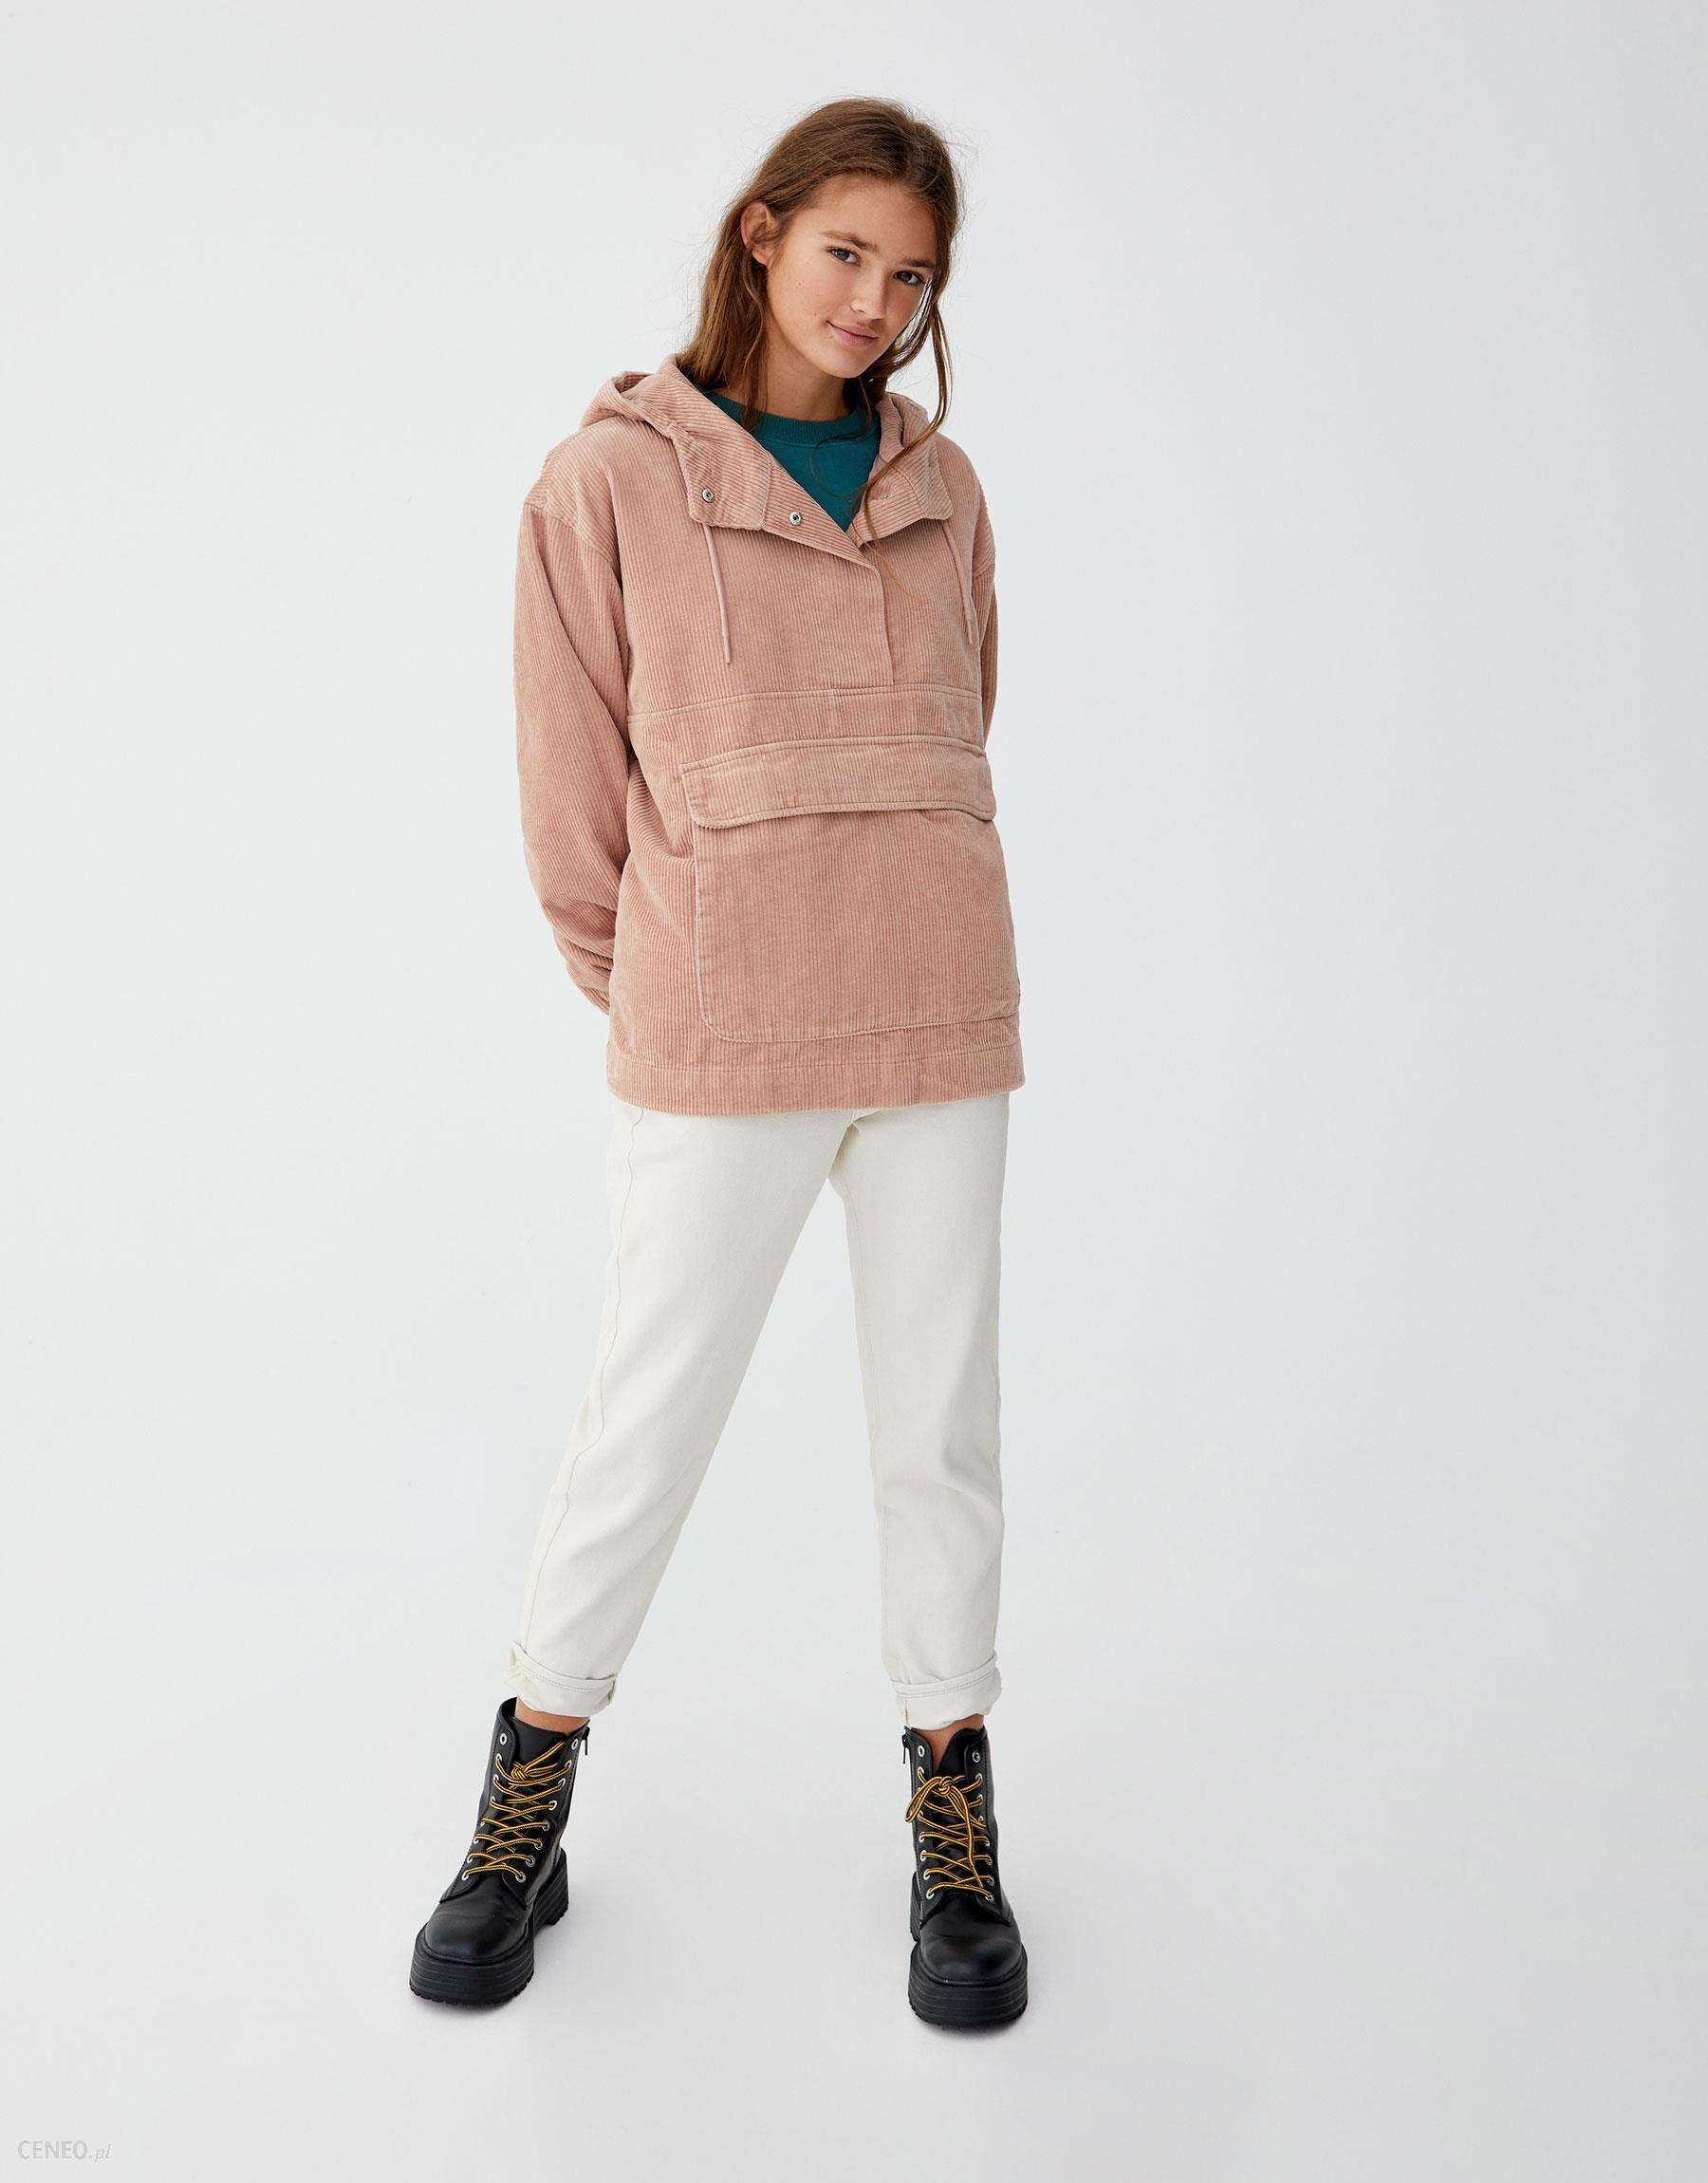 brillo de color como serch famosa marca de diseñador Cazadora canguro capucha pana Pull&Bear - Ceny i opinie - Ceneo.pl